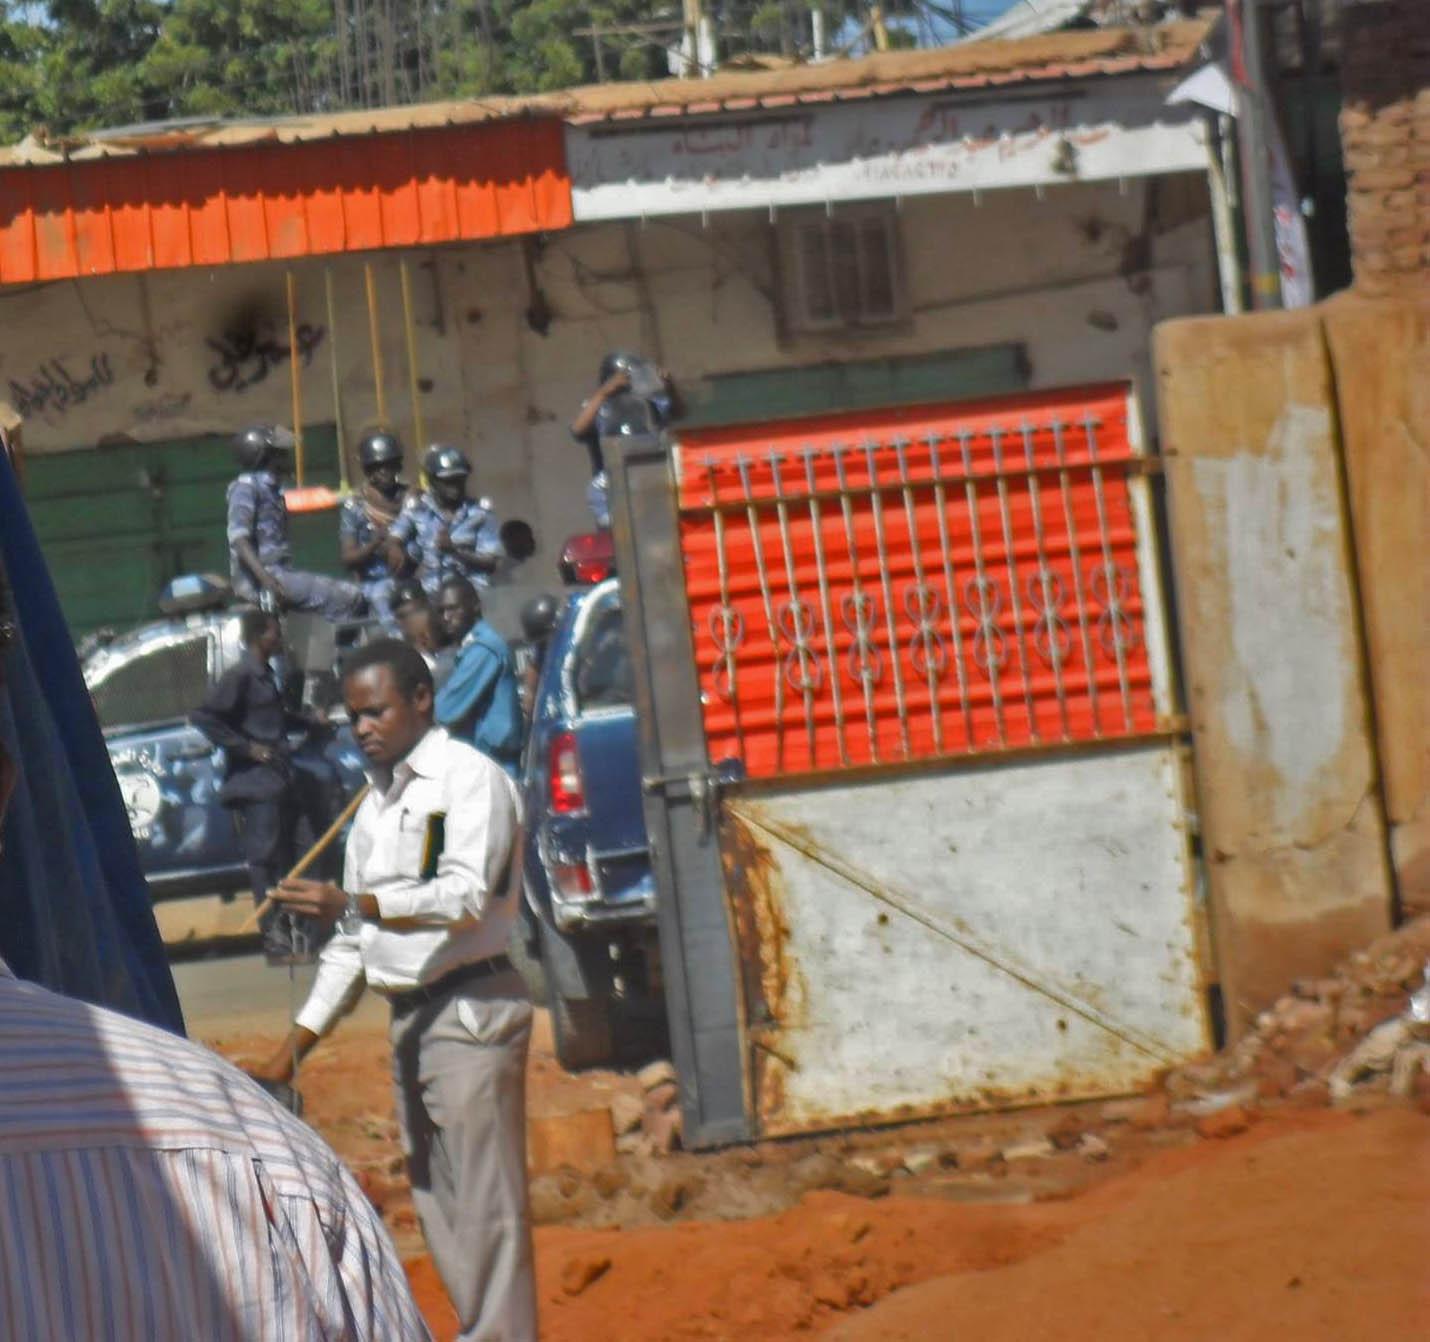 Police arrive at Khartoum Bahri Evangelical Church in North Khartoum on a previous raid on Nov. 24, 2014. (Morning Star News)